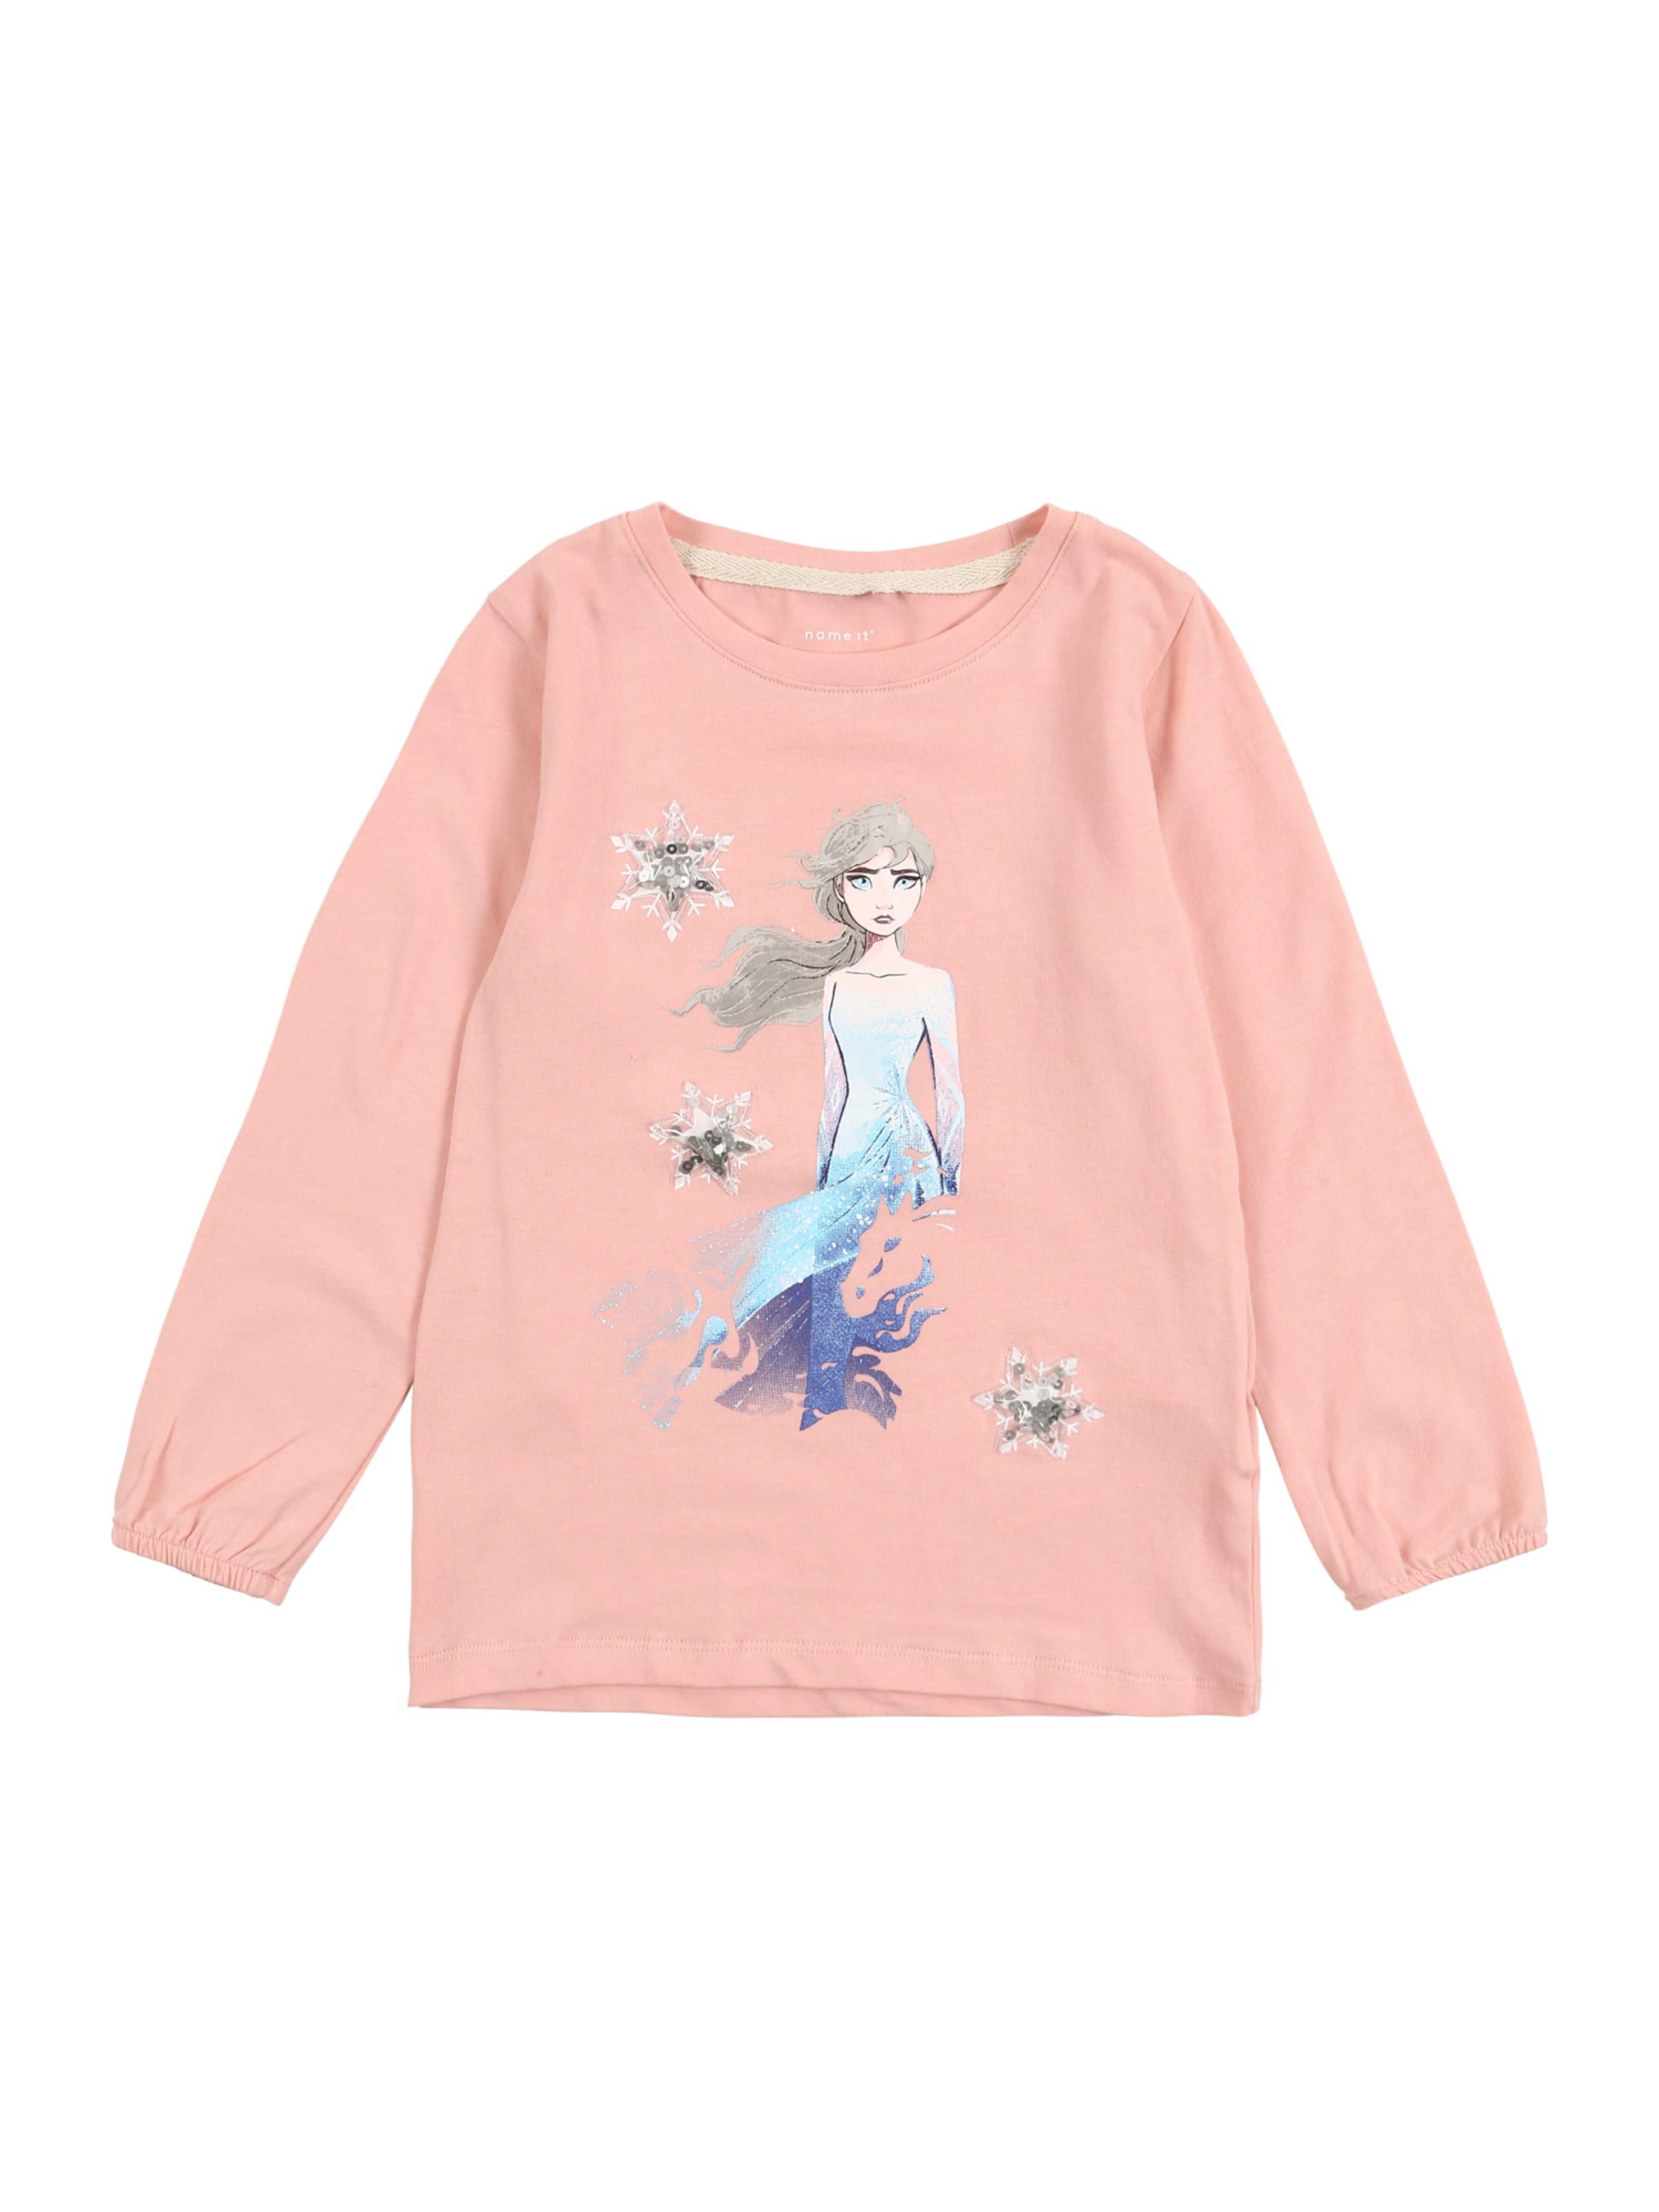 Kinder,  Mädchen,  Kinder NAME IT Longsleeve 'Die Eiskönigin' pink | 05714507168013